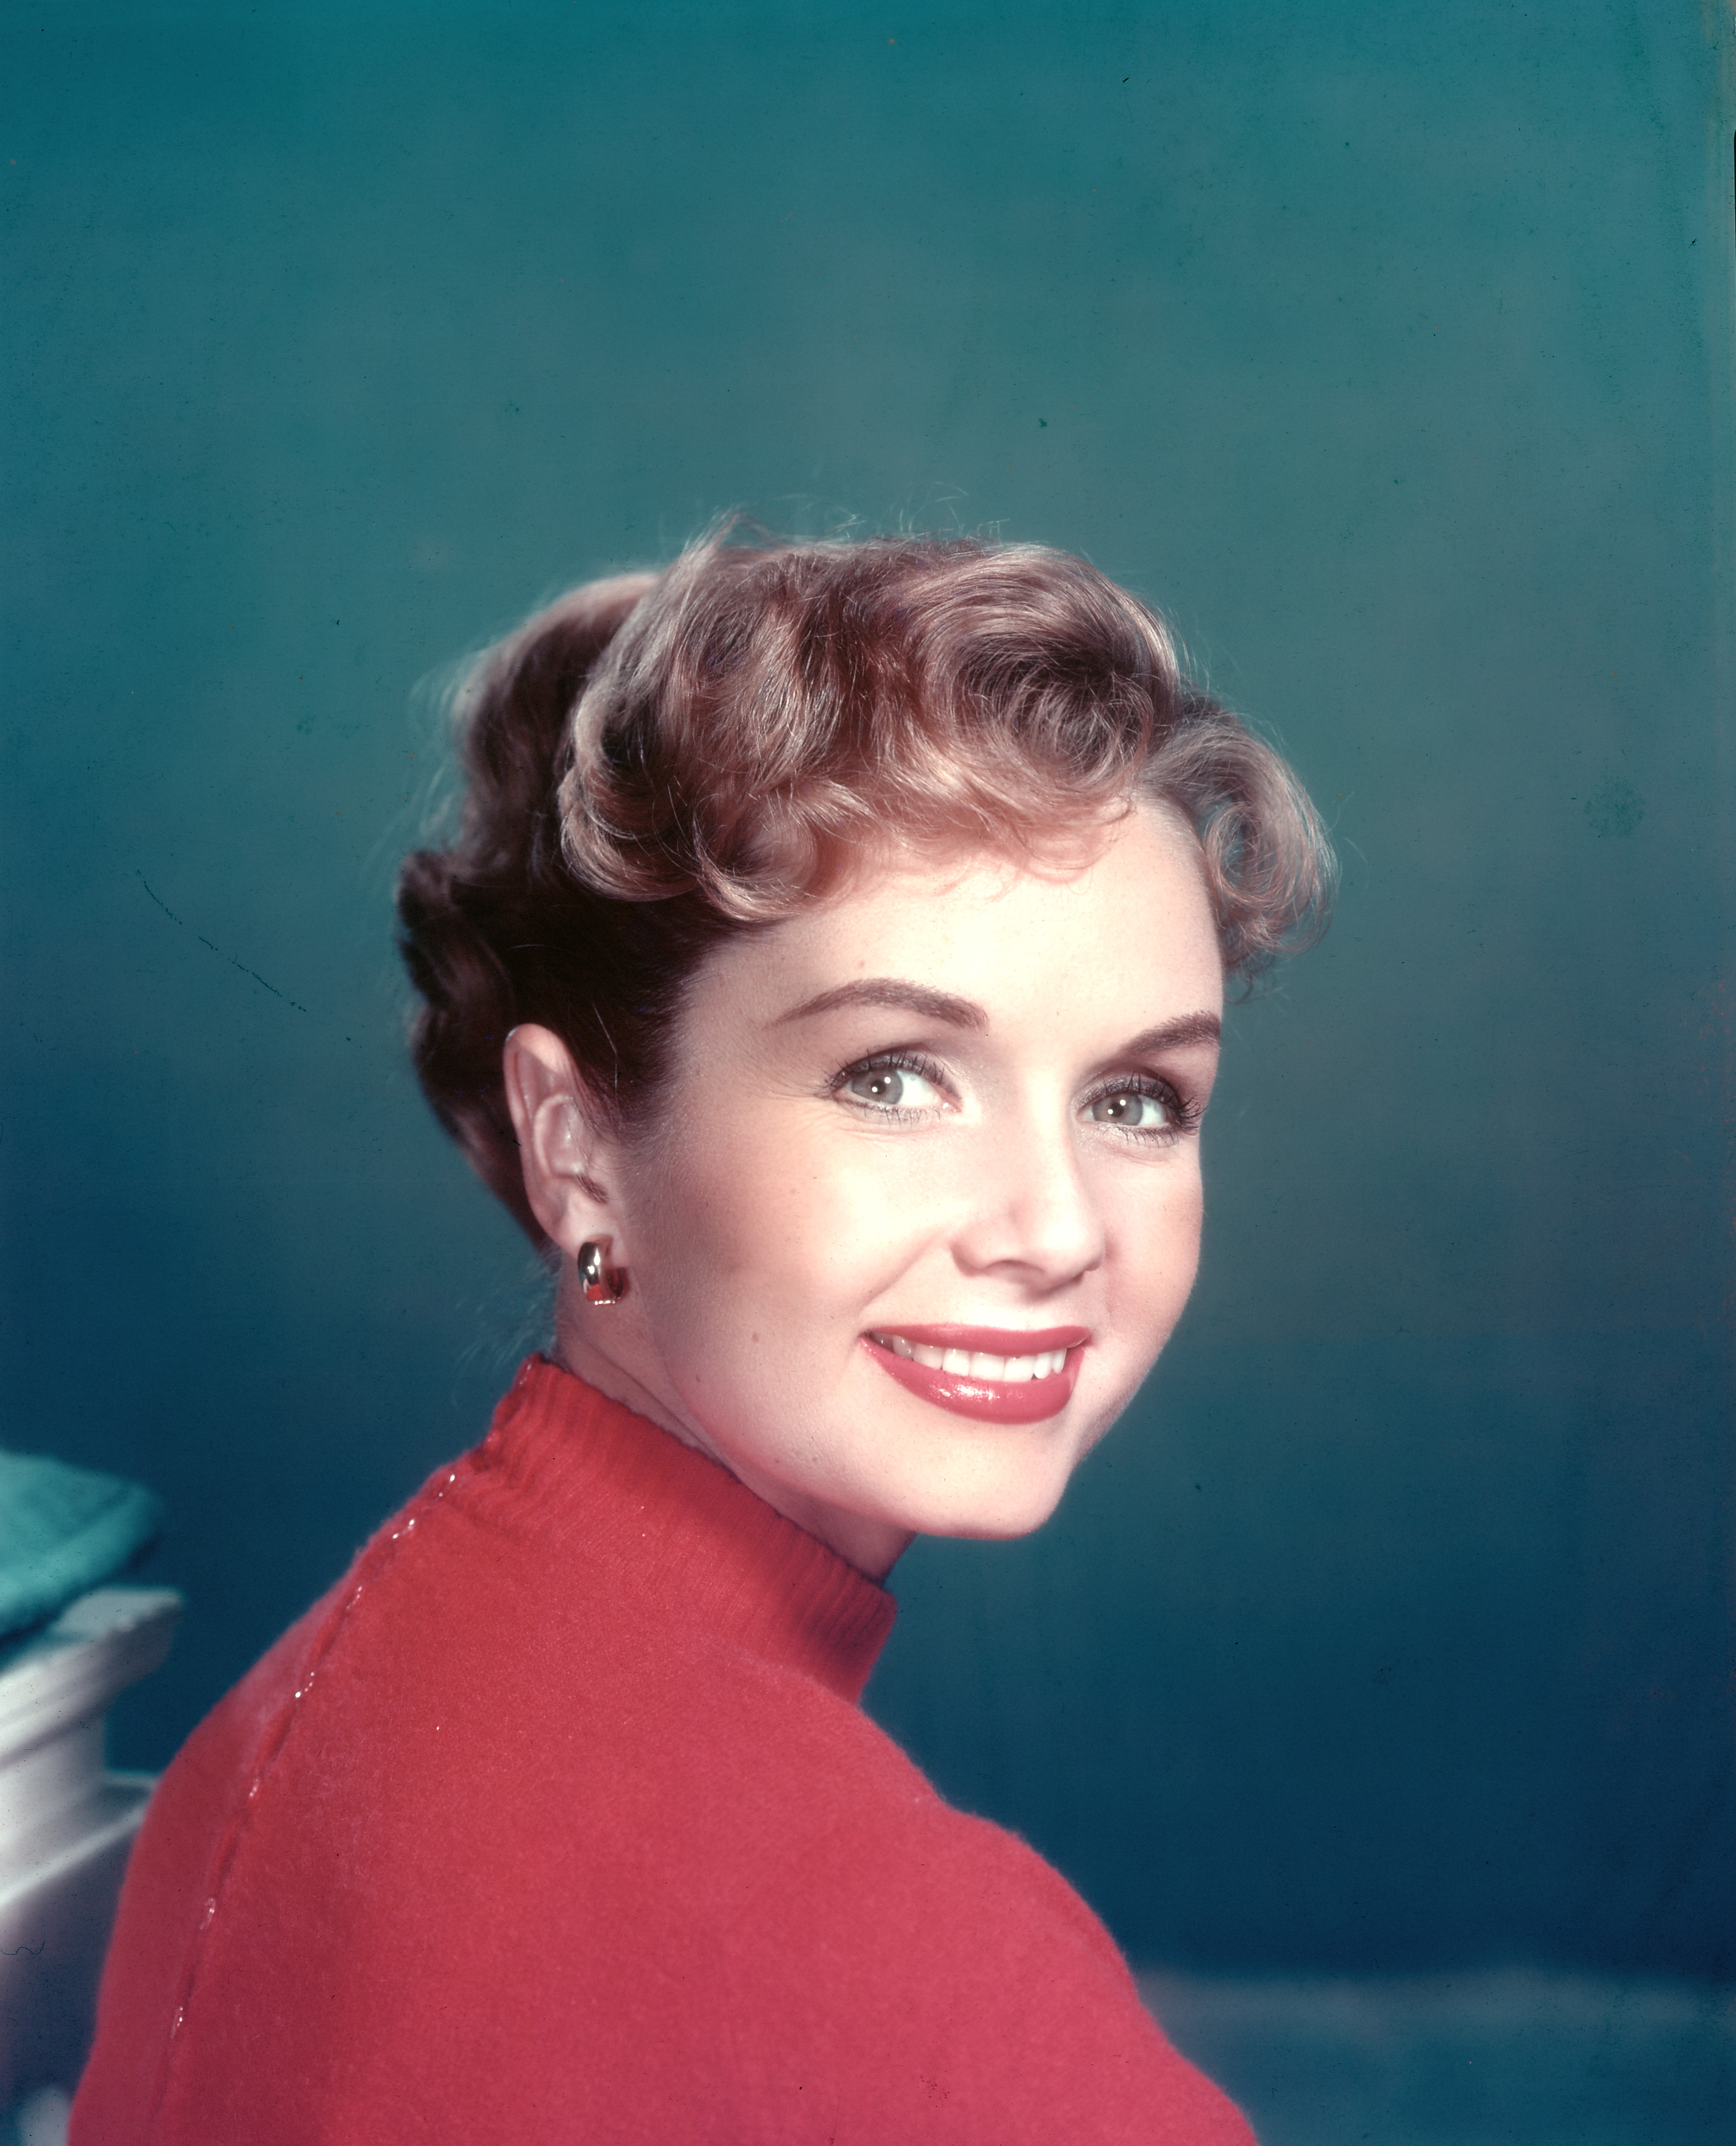 Debbie Reynolds pic #423470 - Debbie_Reynolds_HQ_1-22